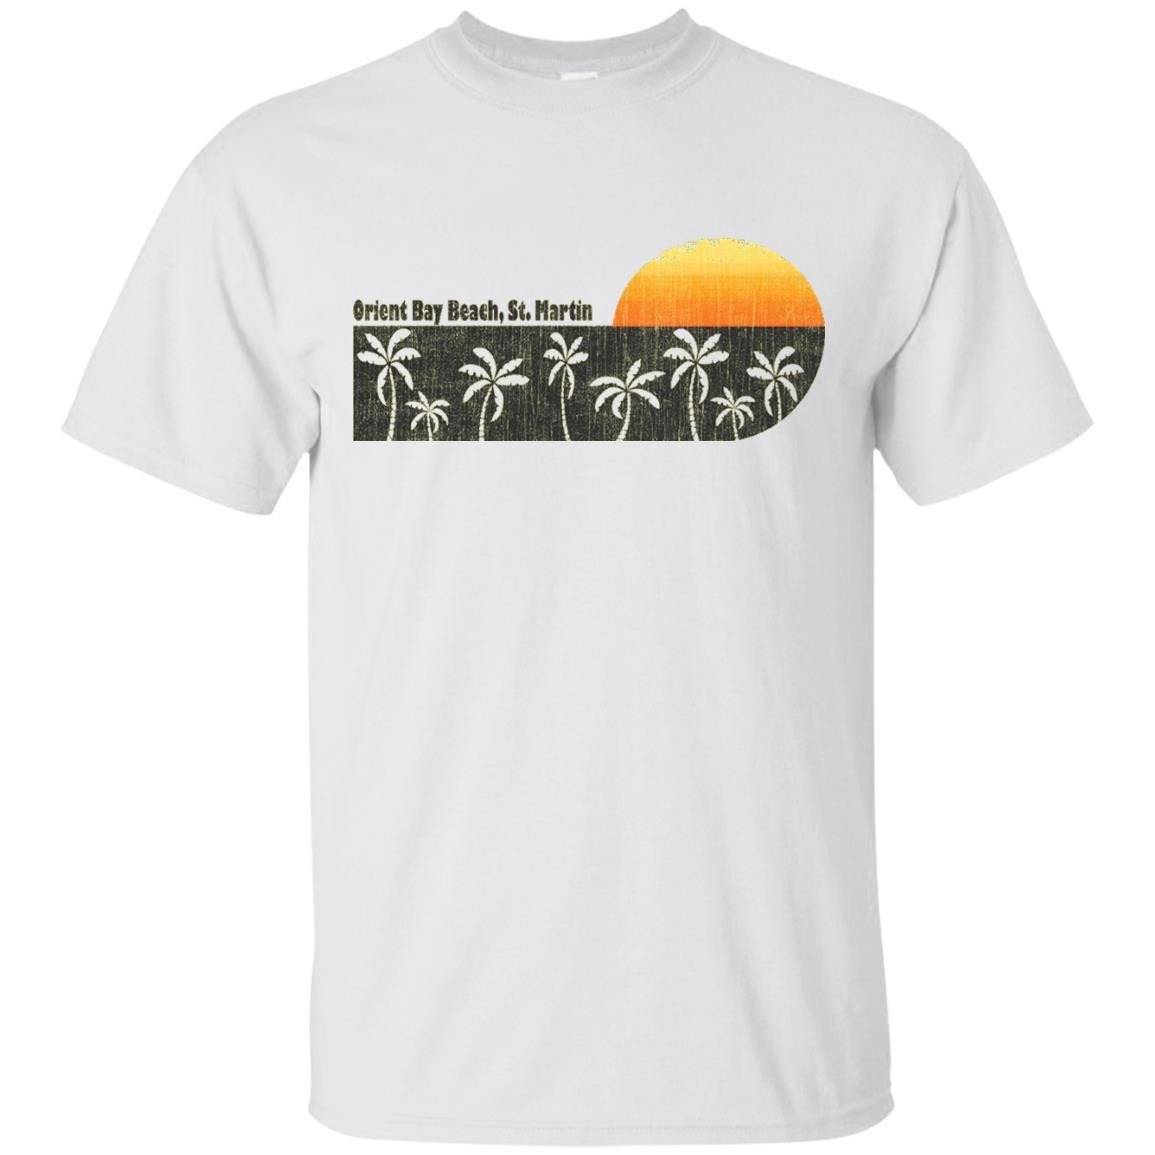 Retro Orient Bay Beach, St. Martin T-Shirt